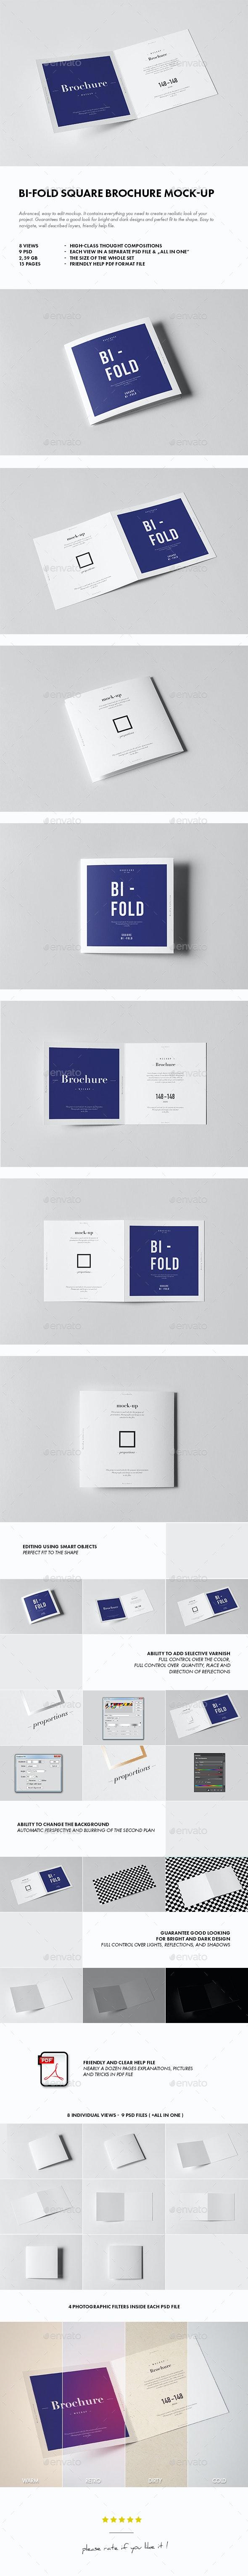 Bi-Fold Square Brochure Mock-up - Brochures Print